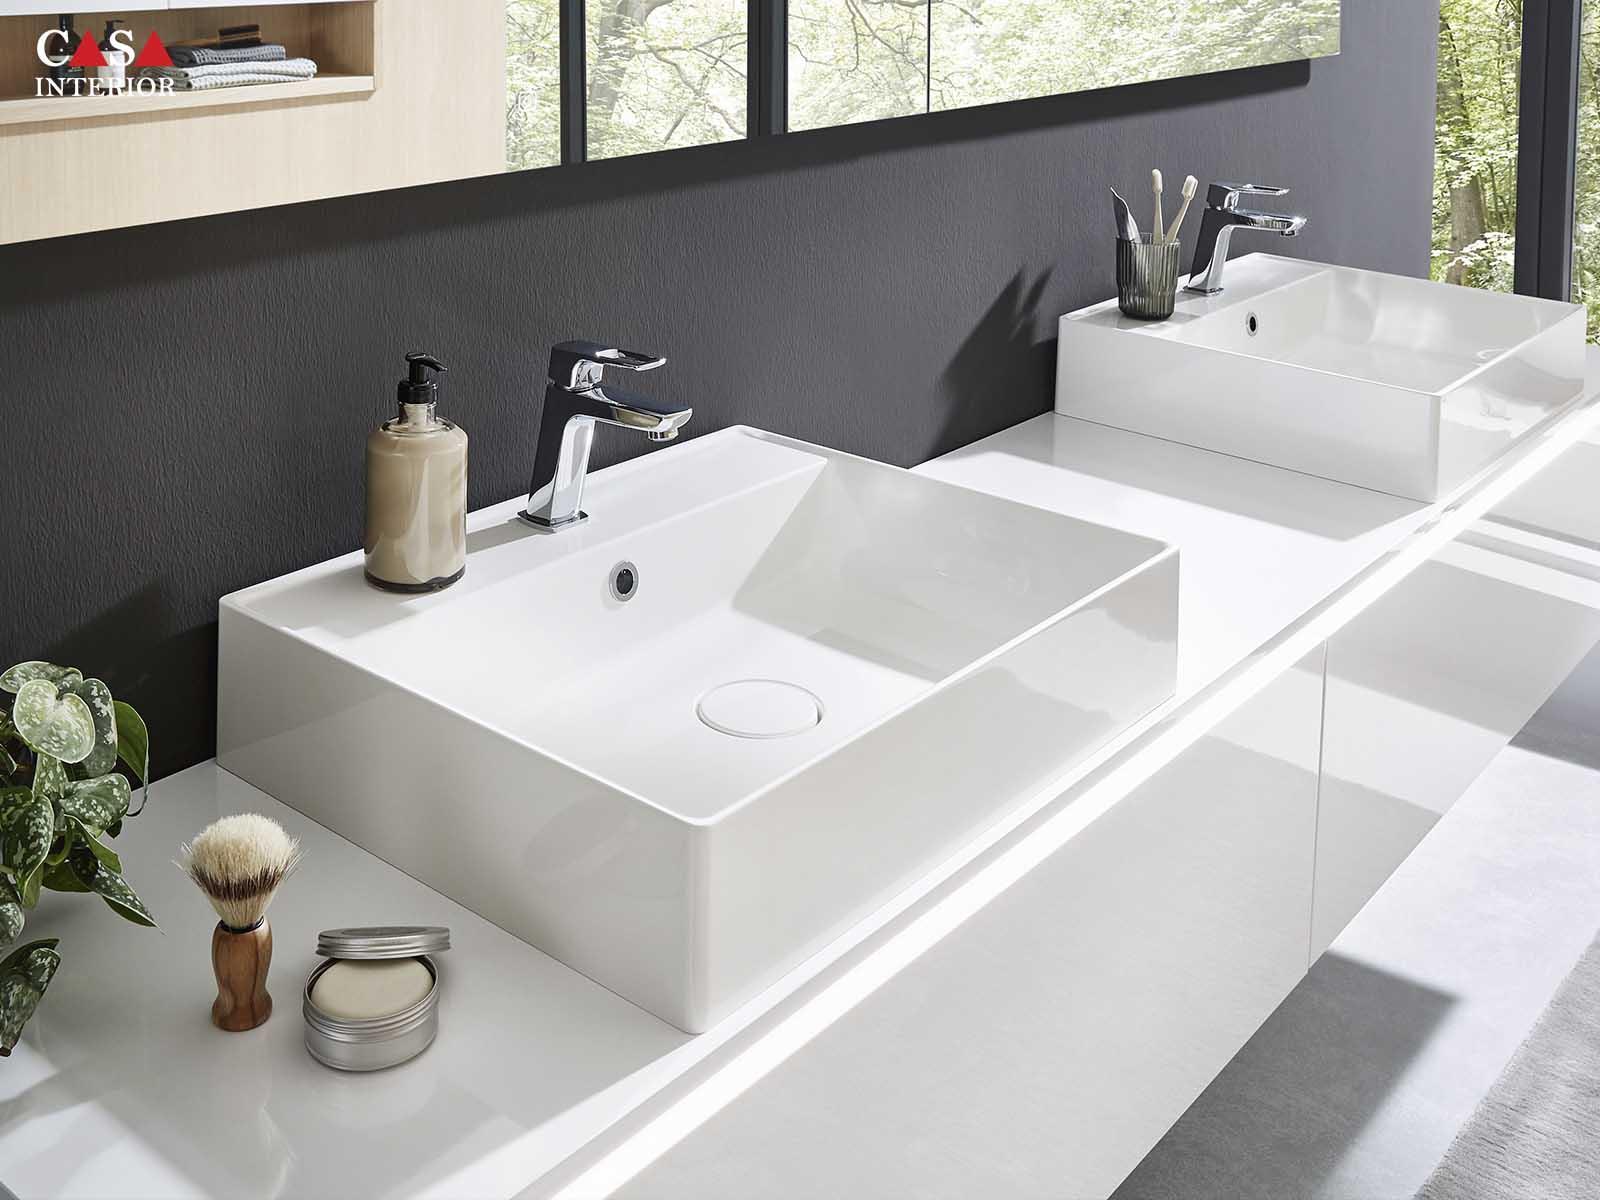 Küchentime Lux Lacquer, alpine white high gloss 817 - Flash Lacquered laminate, alpine white high gloss 503 - Bathroom